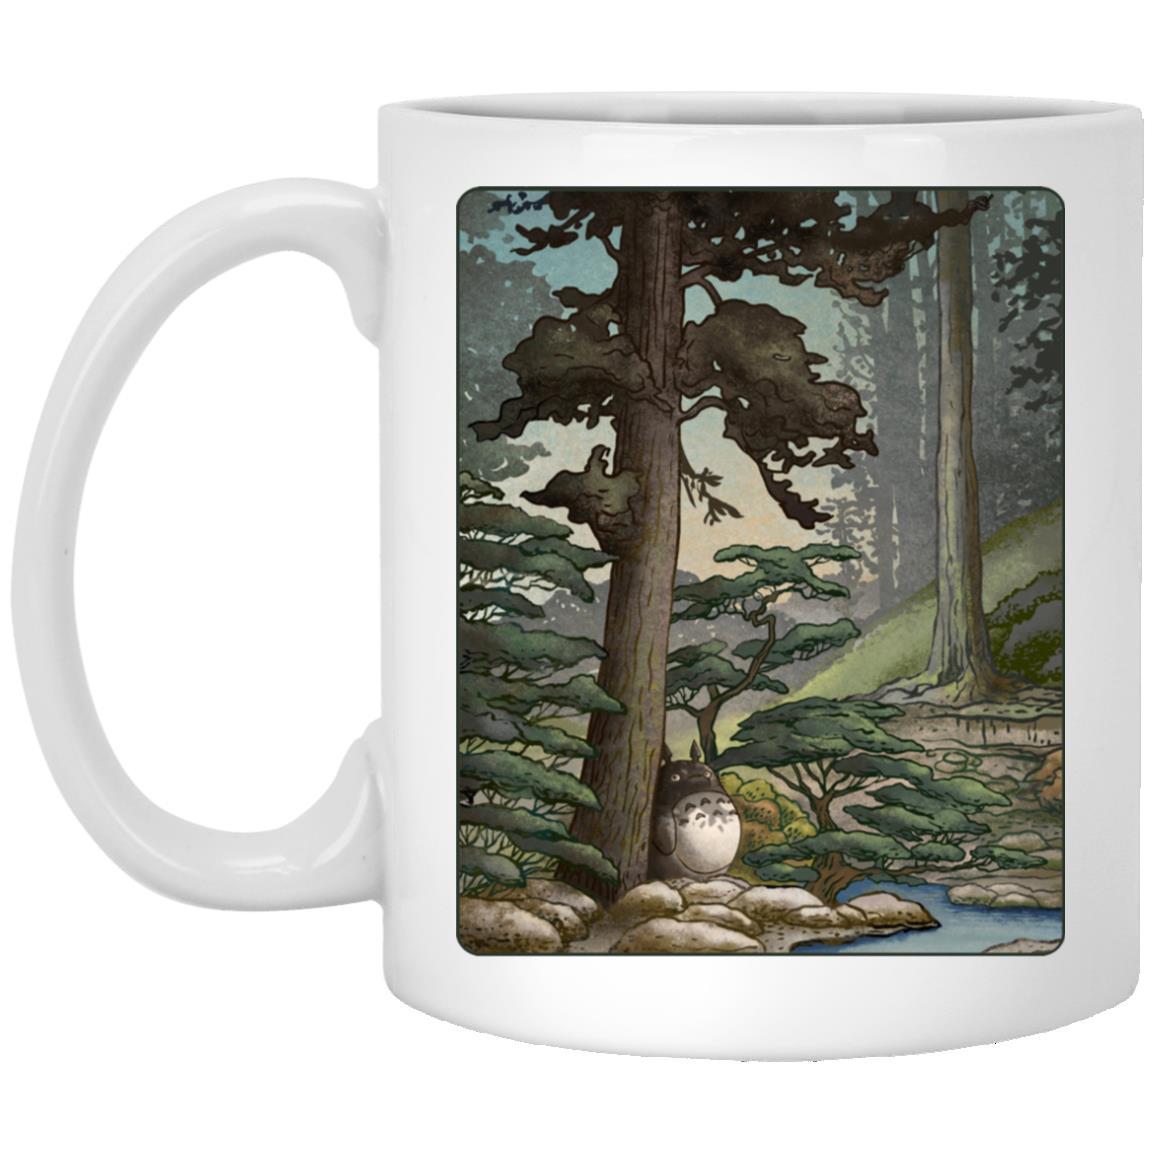 Totoro in the Landscape Mug